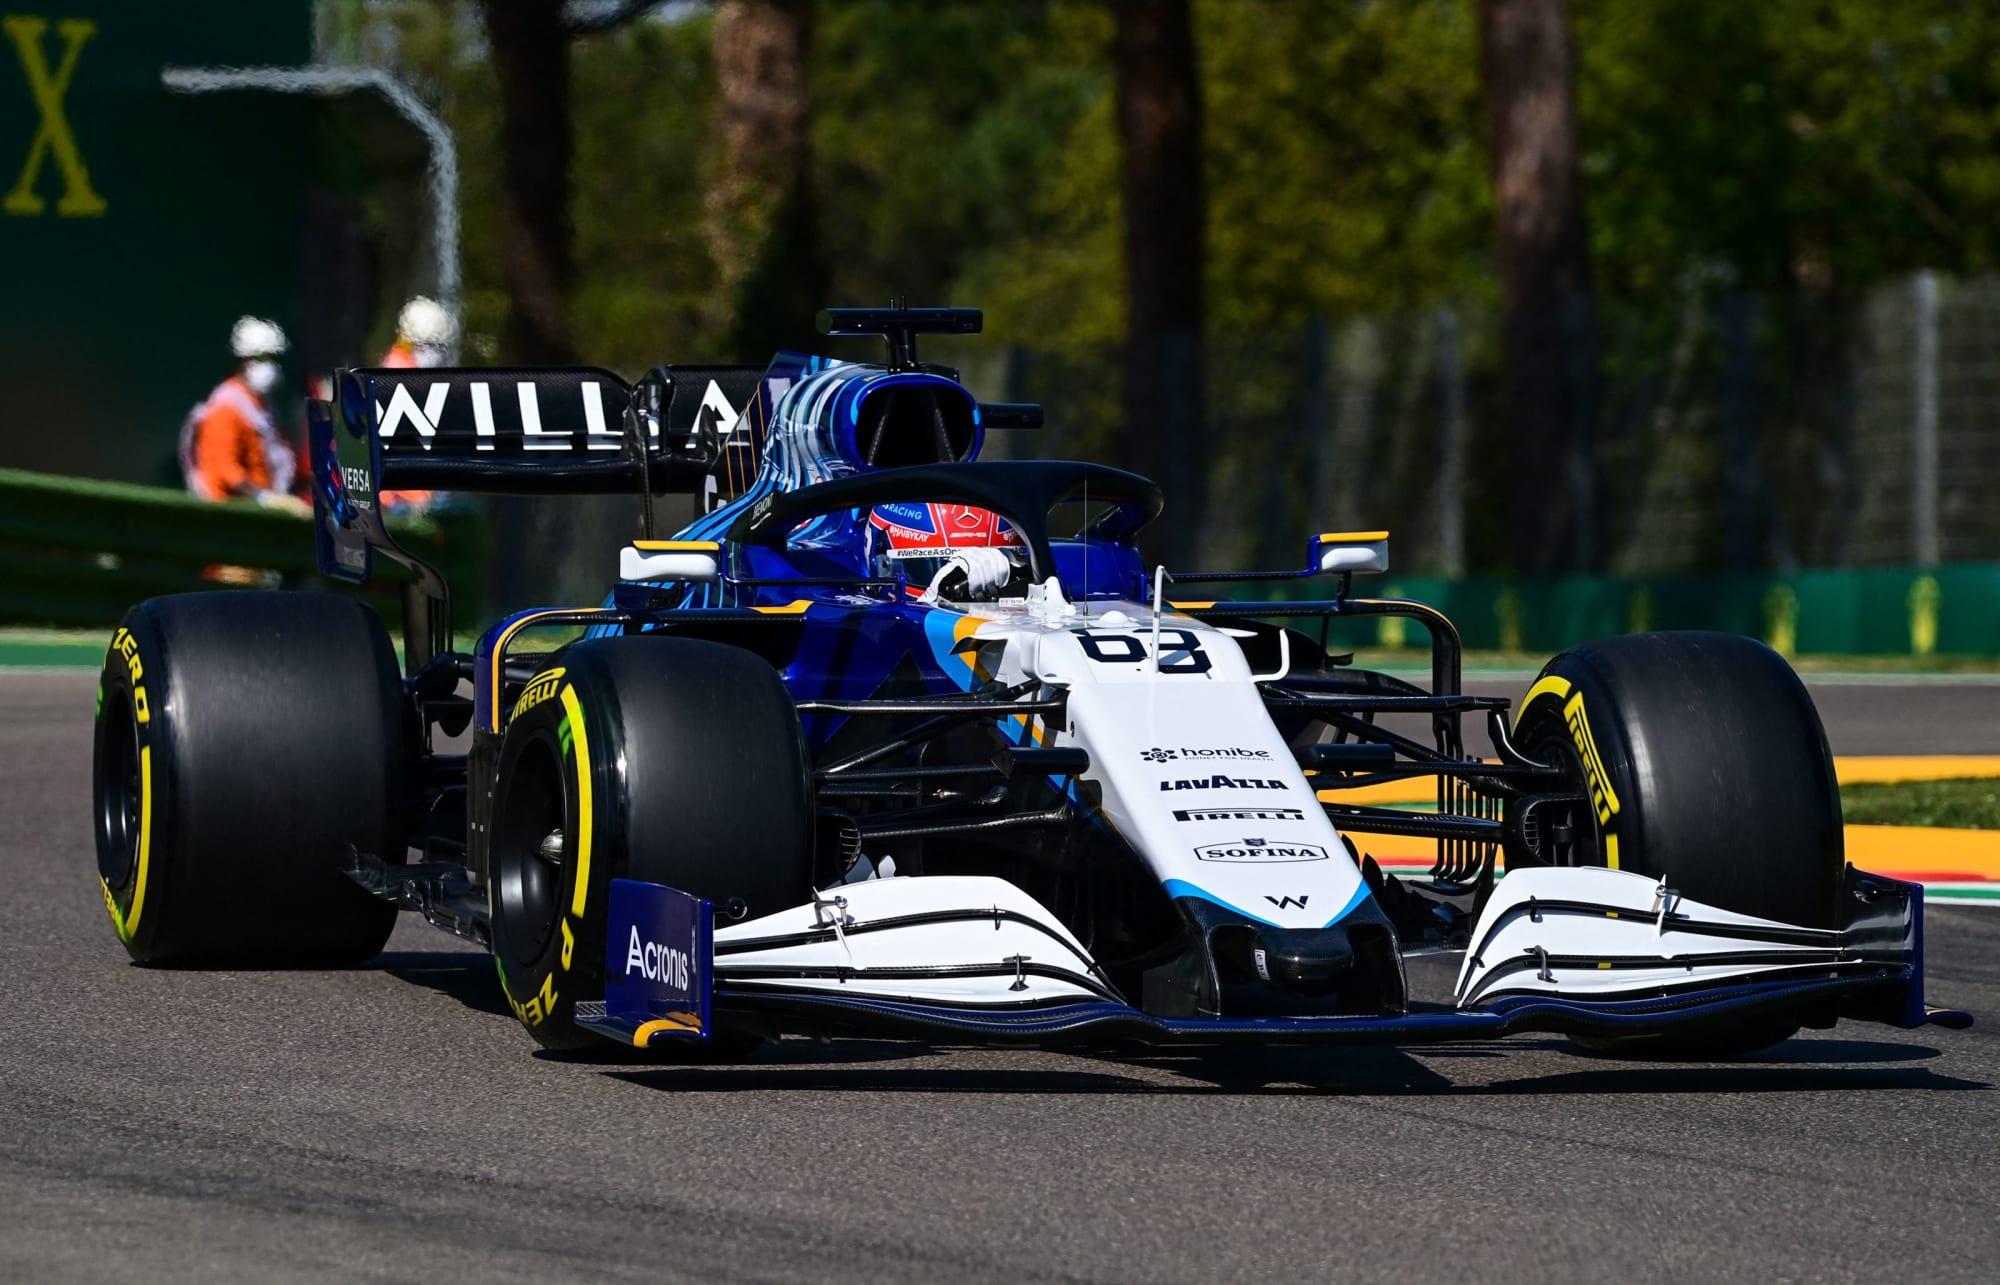 Formula 1: George Russell's historic streak intact despite scare